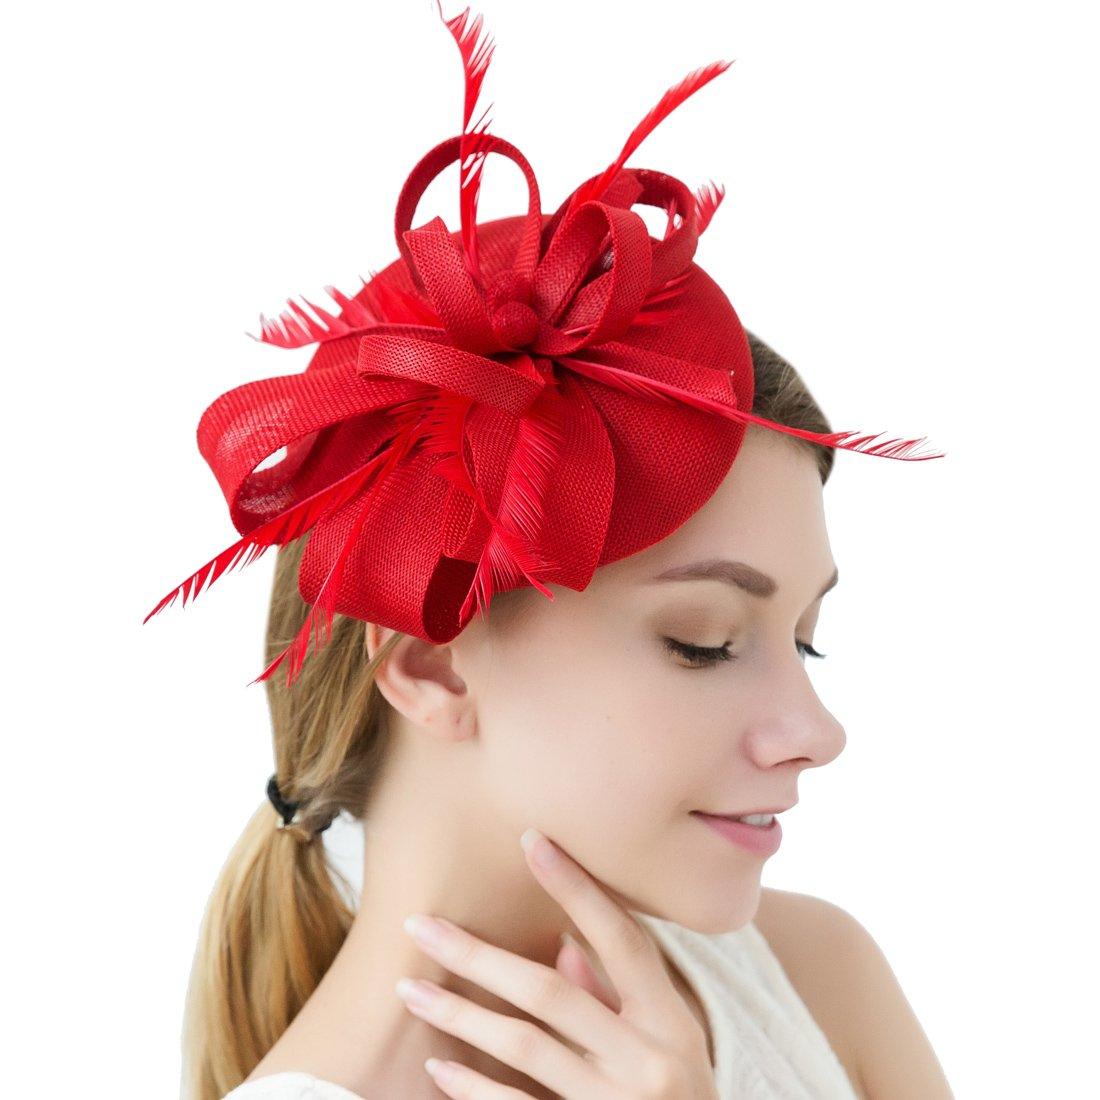 Women Elegant Fascinator Hat Bridal Feather Hair Clip Accessories Cocktail Royal Ascot